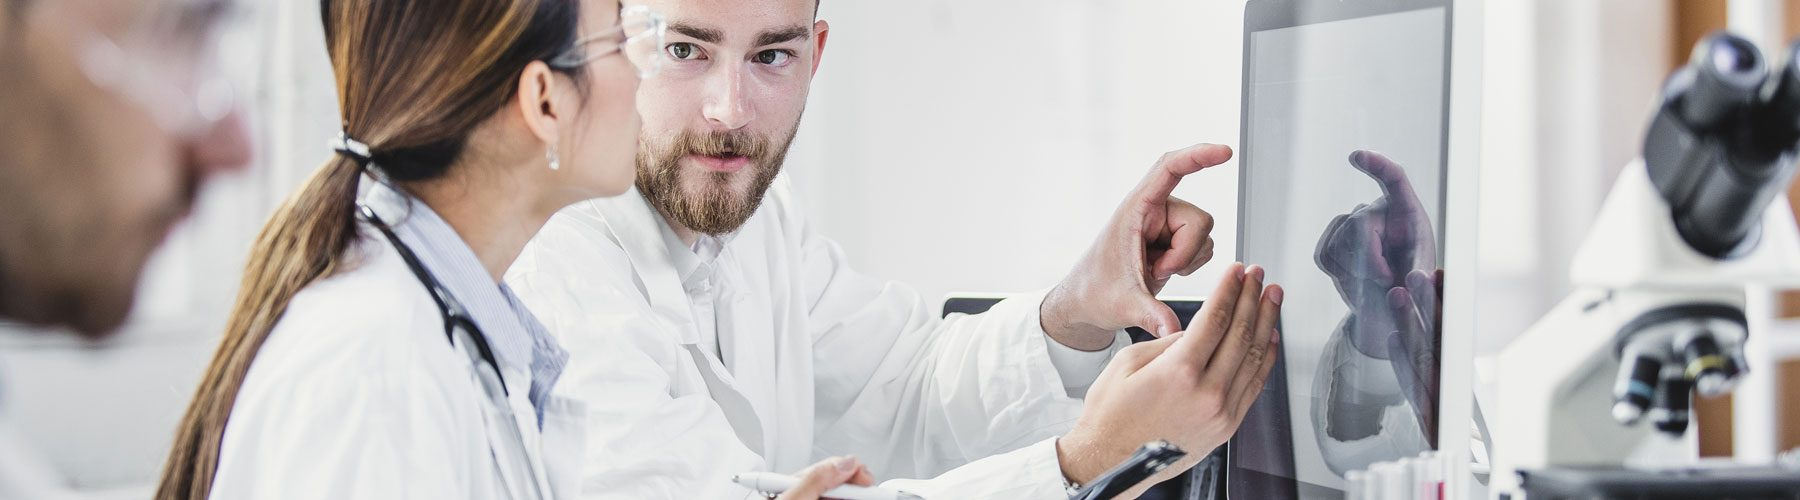 UConn Healthcare Innovation Online Graduate Certificate